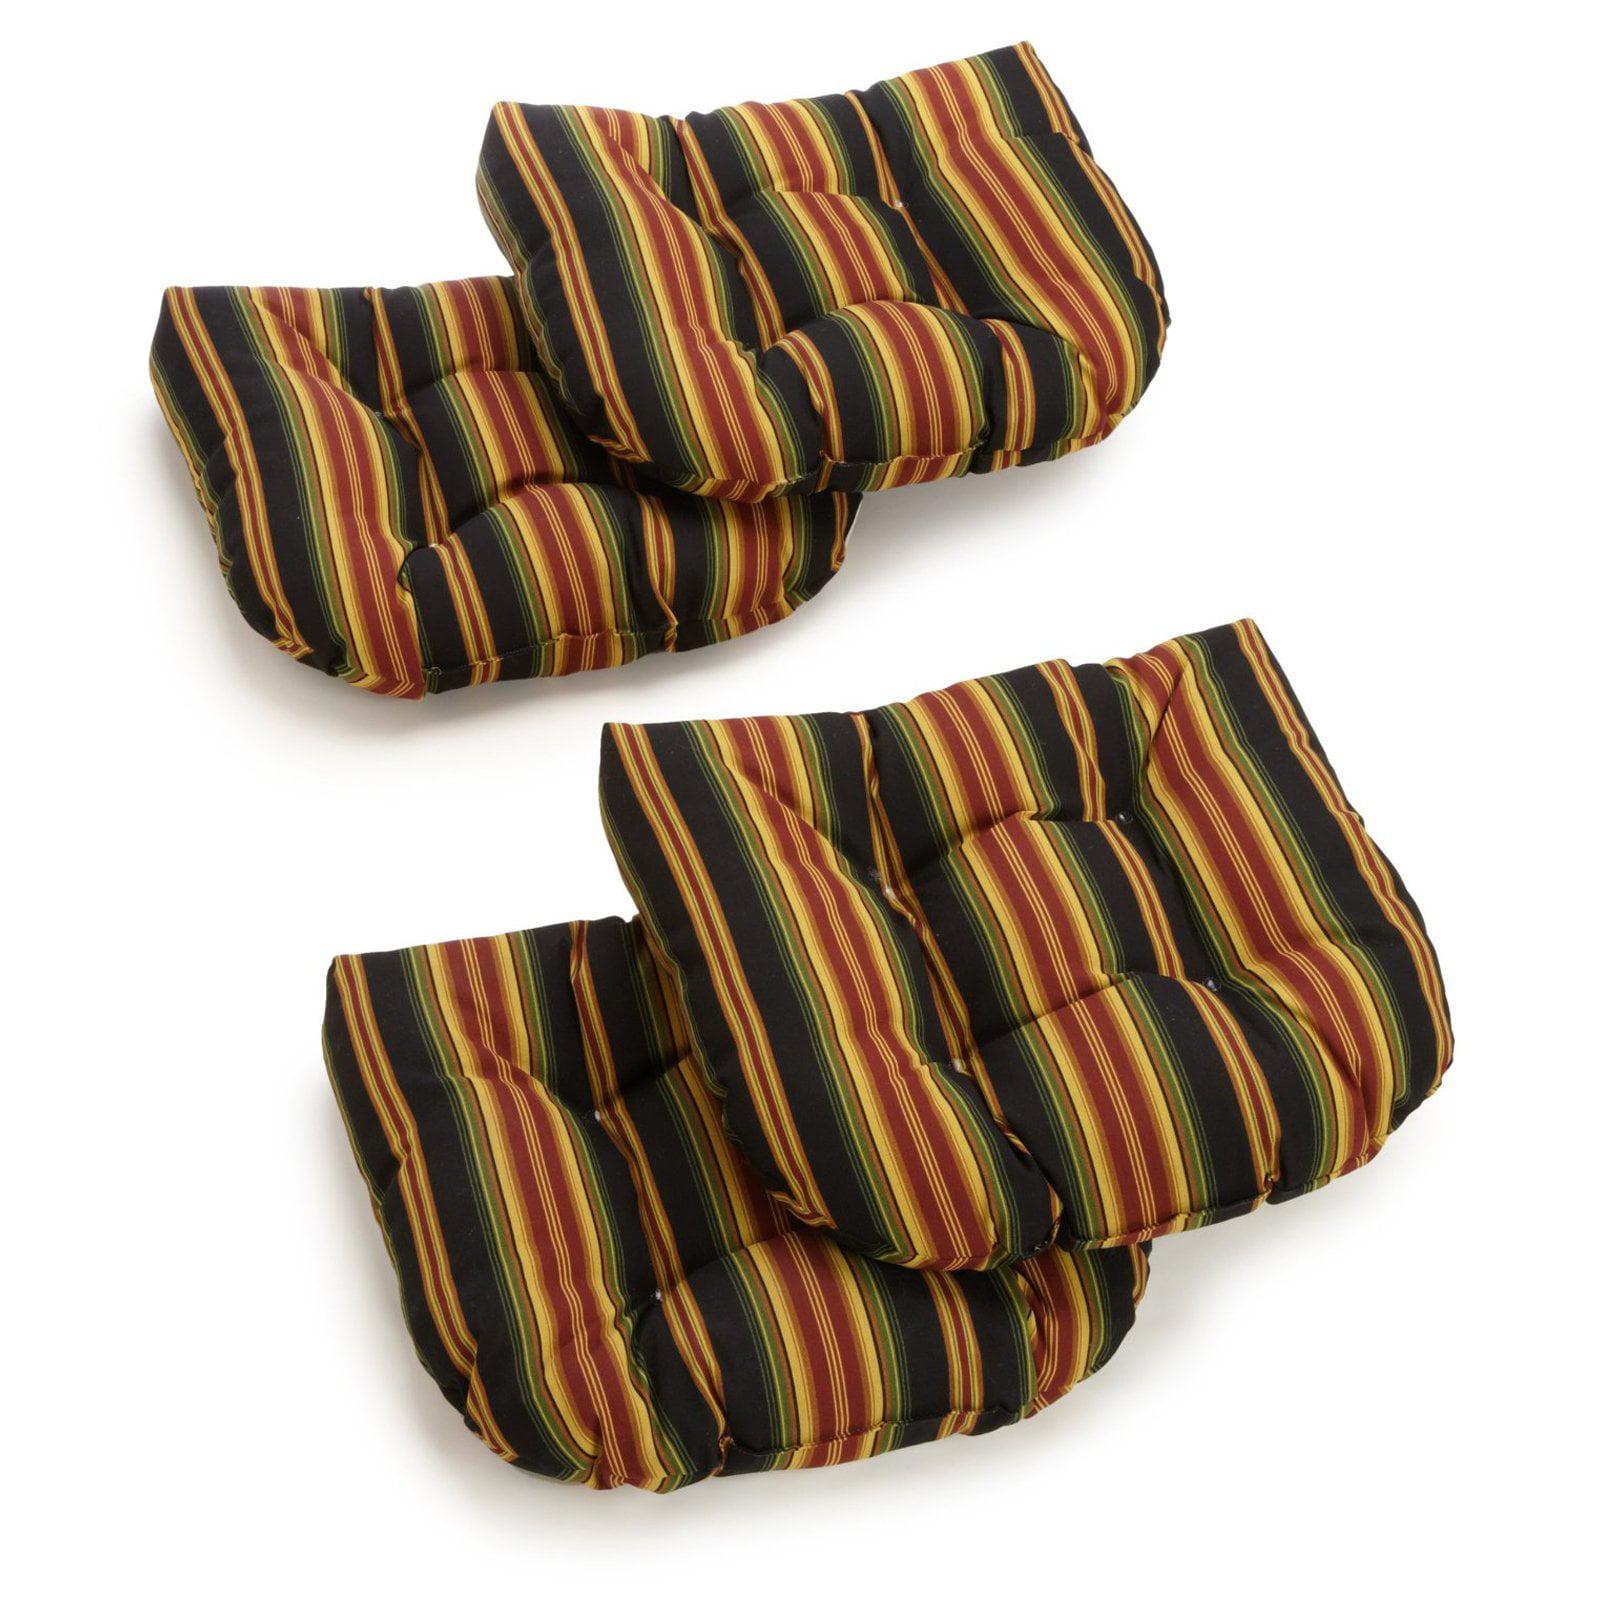 Blazing Needles Reo Striped Outdoor U Shaped Chair Cushion